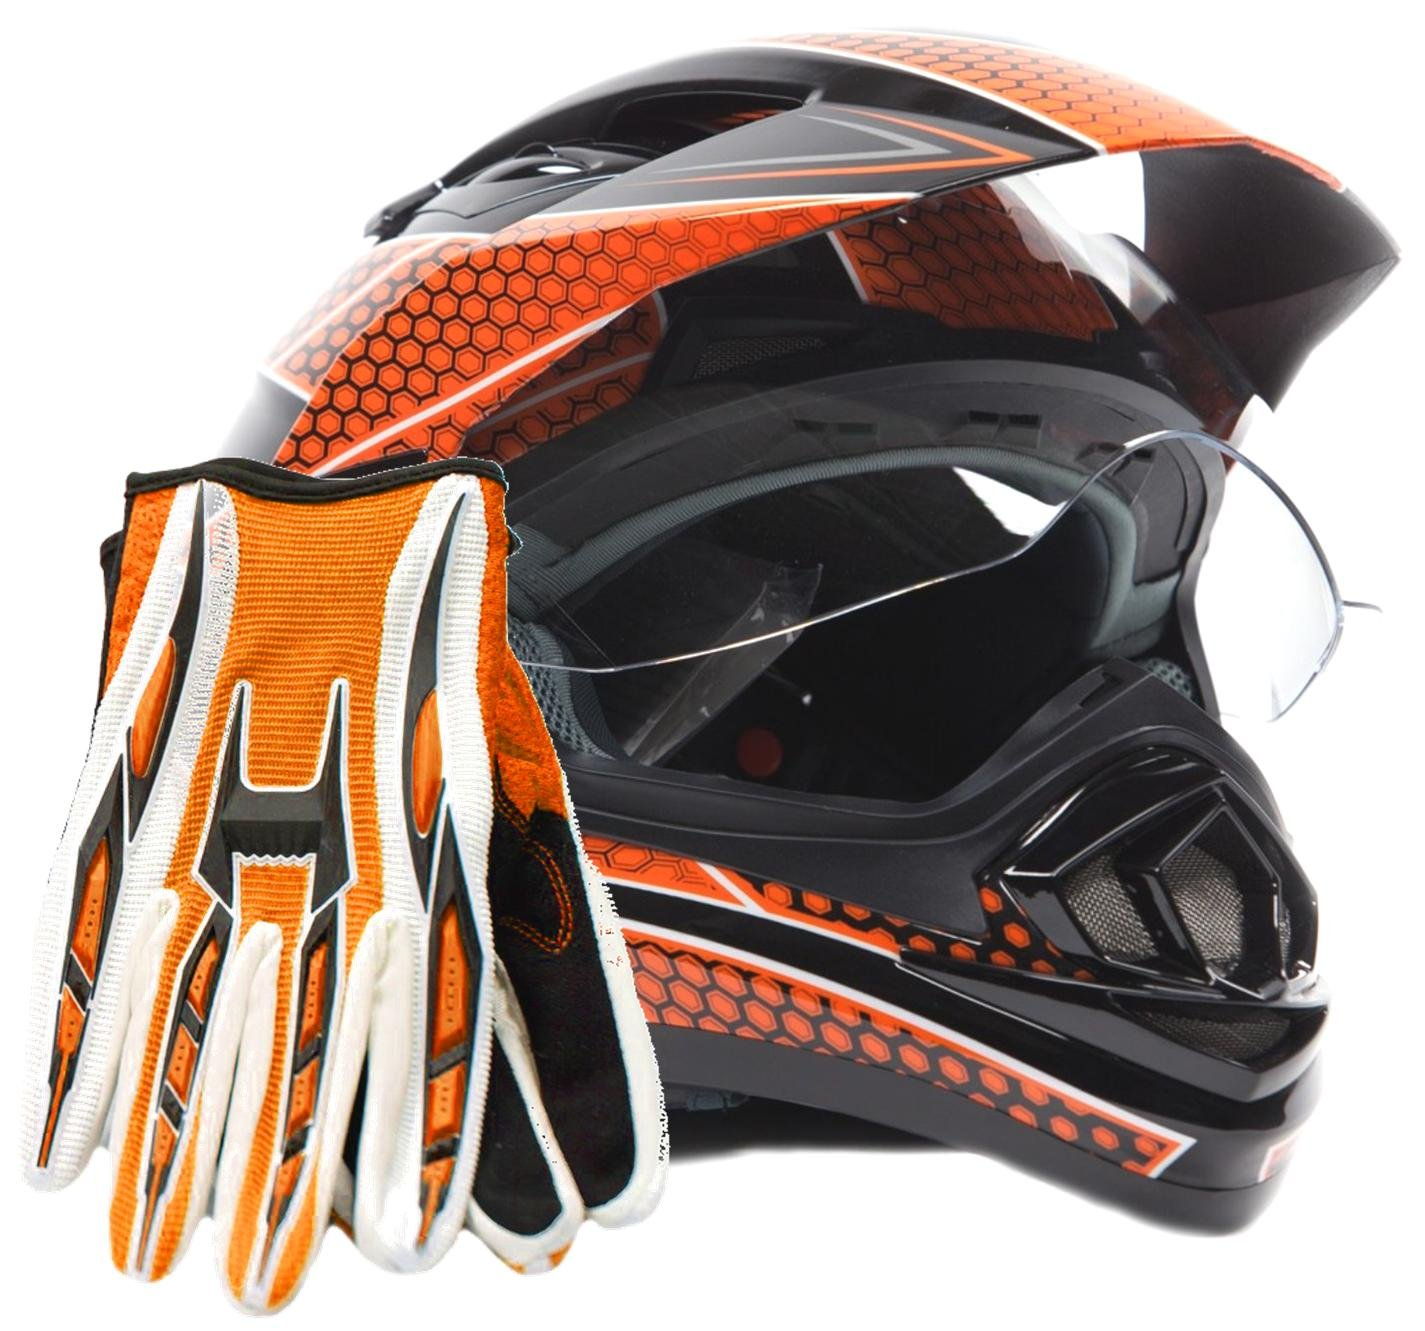 Dual Sport Helmet Combo w/Gloves - Off Road Motocross UTV ATV Motorcycle Enduro - Orange, Black - Large